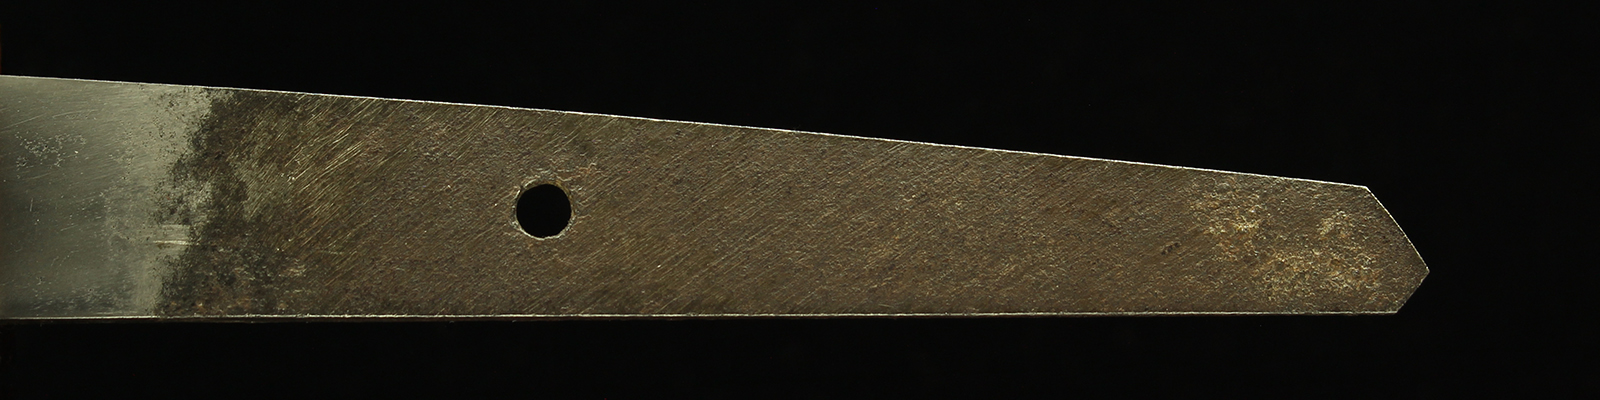 01-054